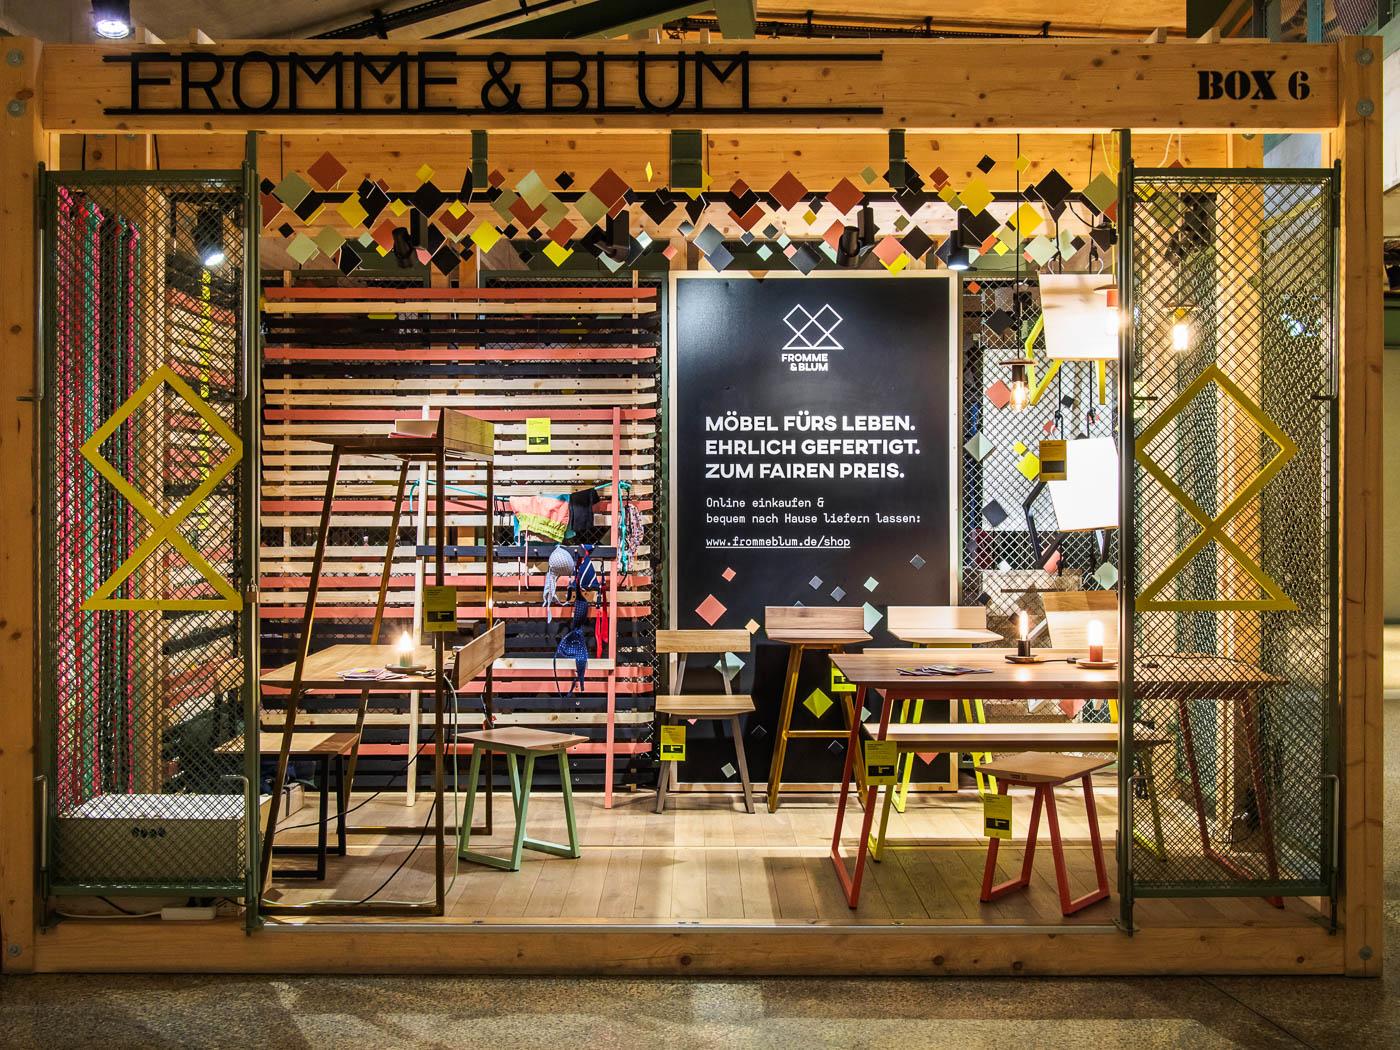 Fromme & Blum Pop-Up-Store, Bikini Berlin